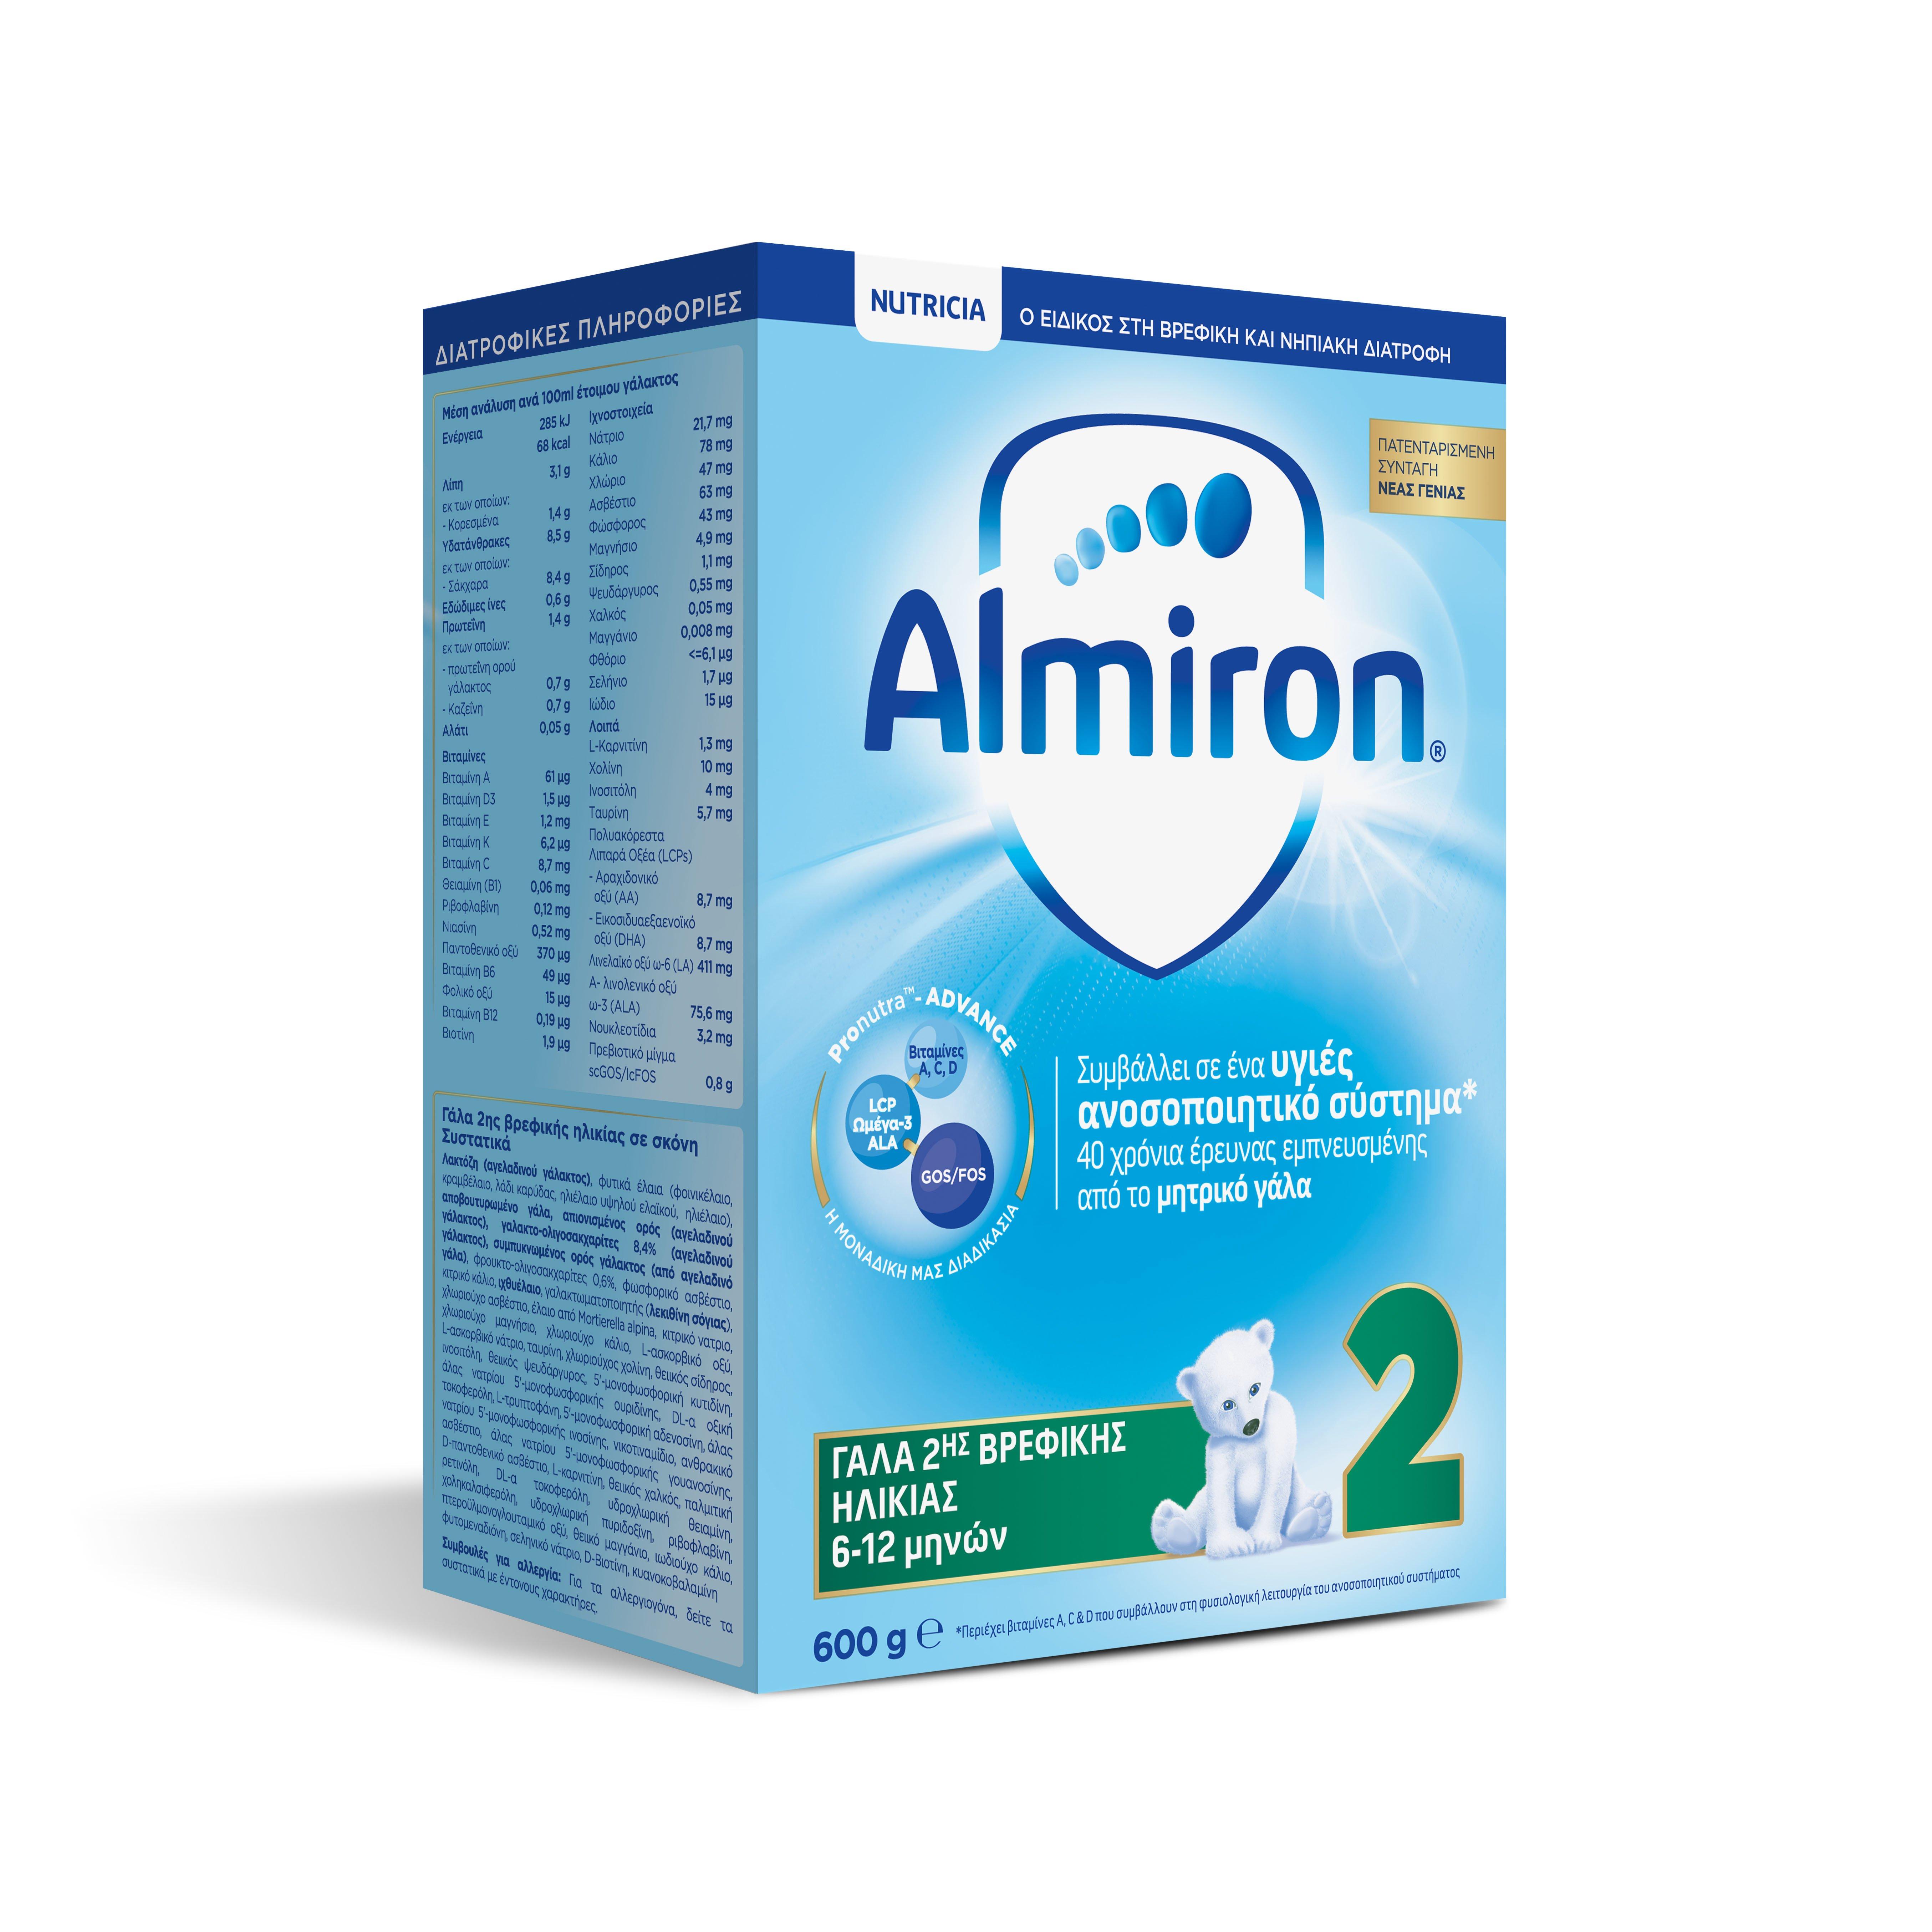 Nutricia Almiron 2 Γάλα 2ης Βρεφικής Ηλικίας από 6-12 μηνών 600gr